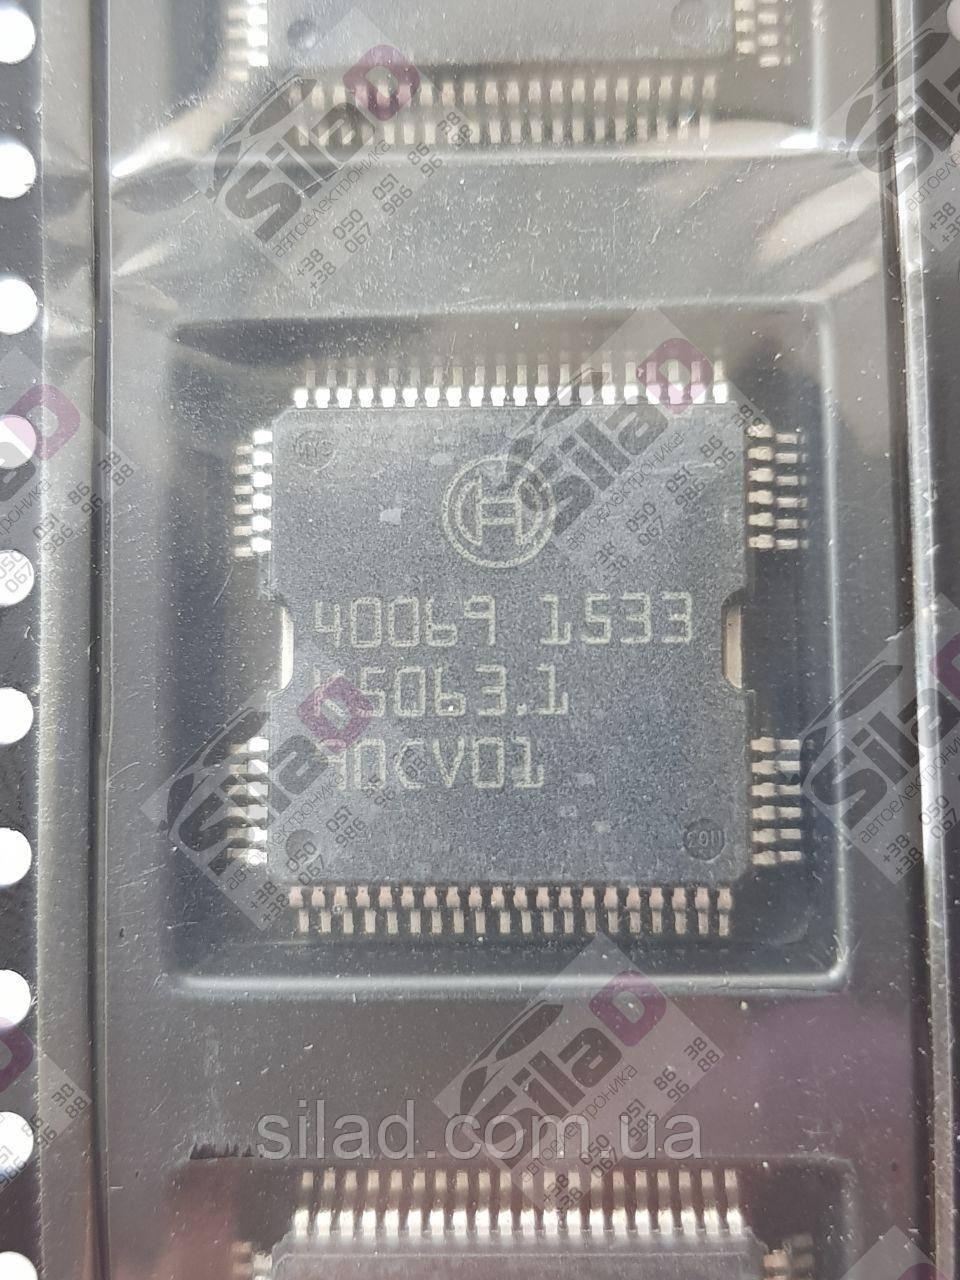 Мікросхема Bosch 40069 корпус PQFP-64